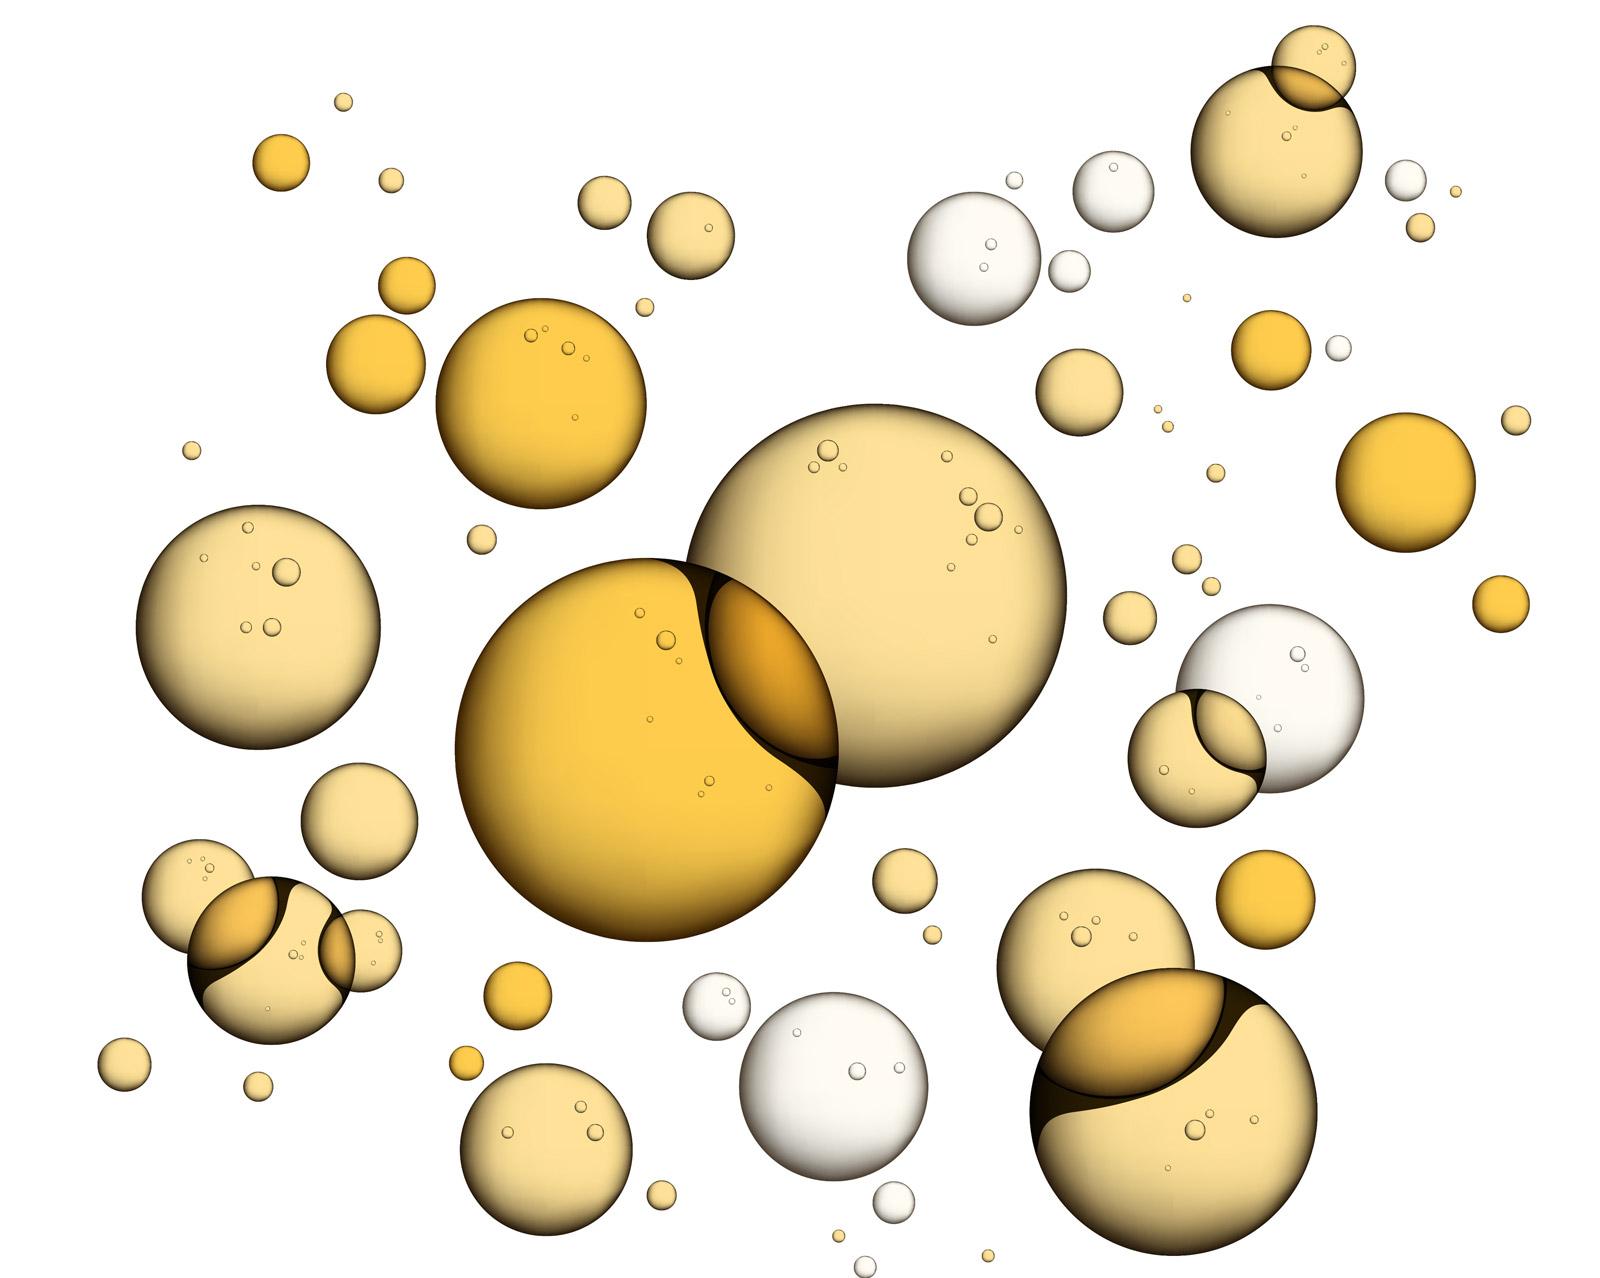 Serum-bubbles